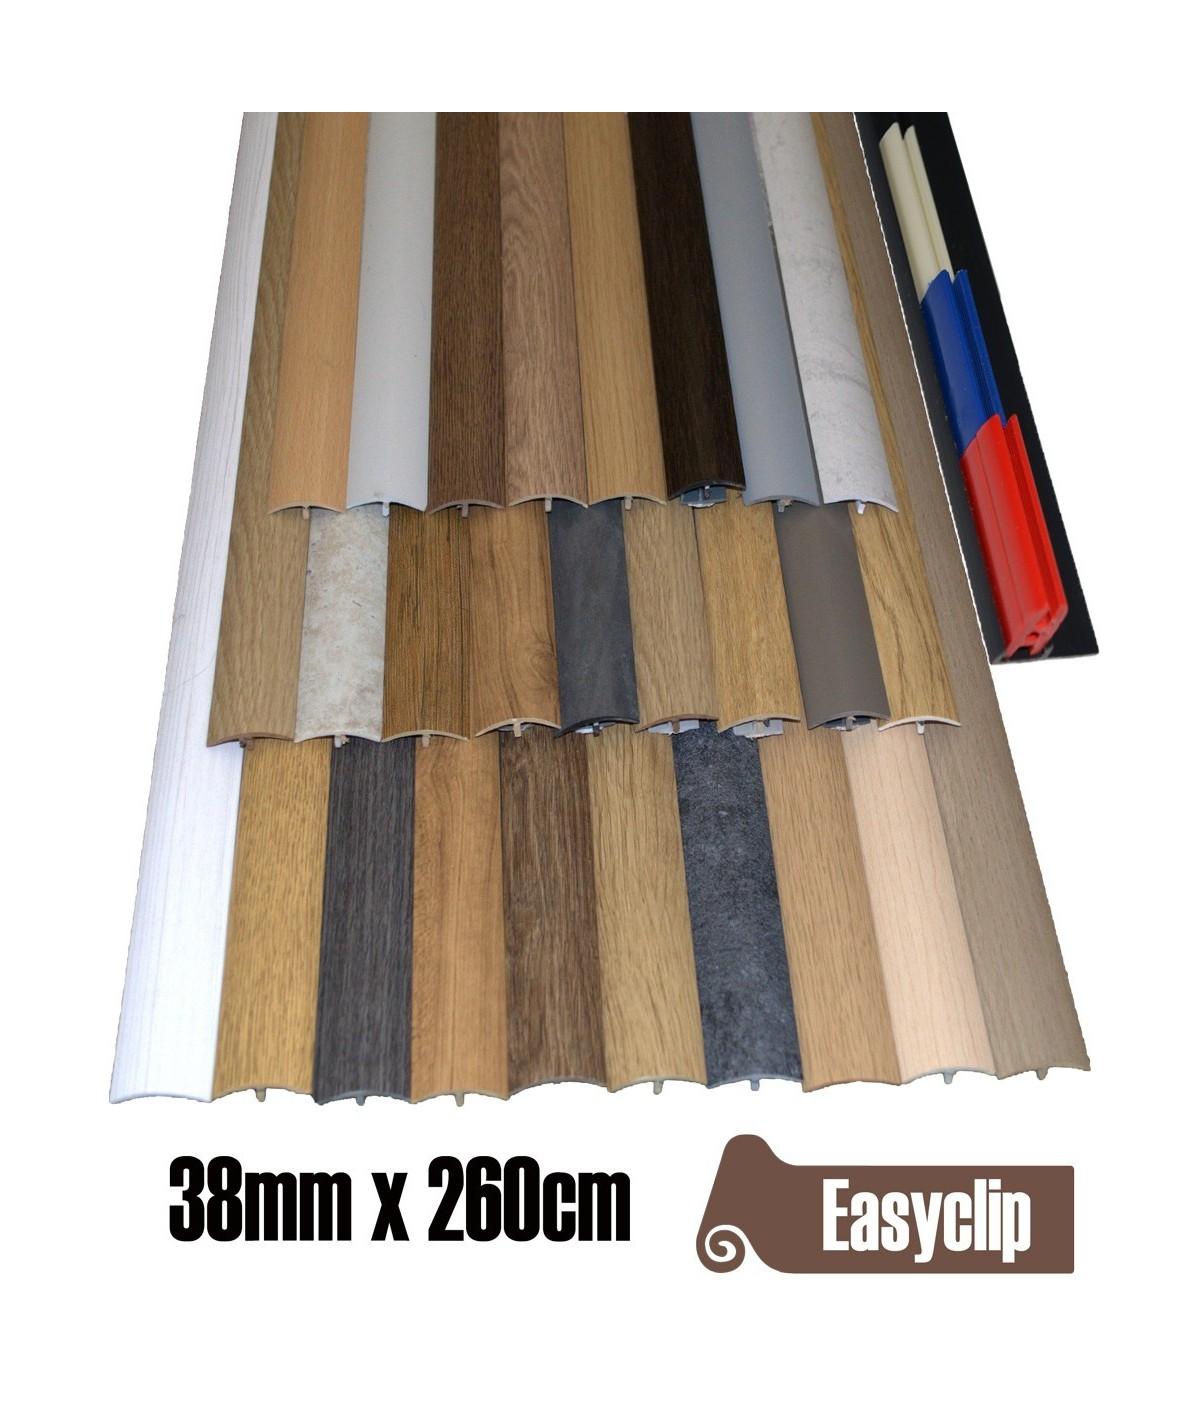 Made to Order 38mm x 260cm  Transition Threshold Strip Door Threshold Multi Purpose Easyclip Adhesive